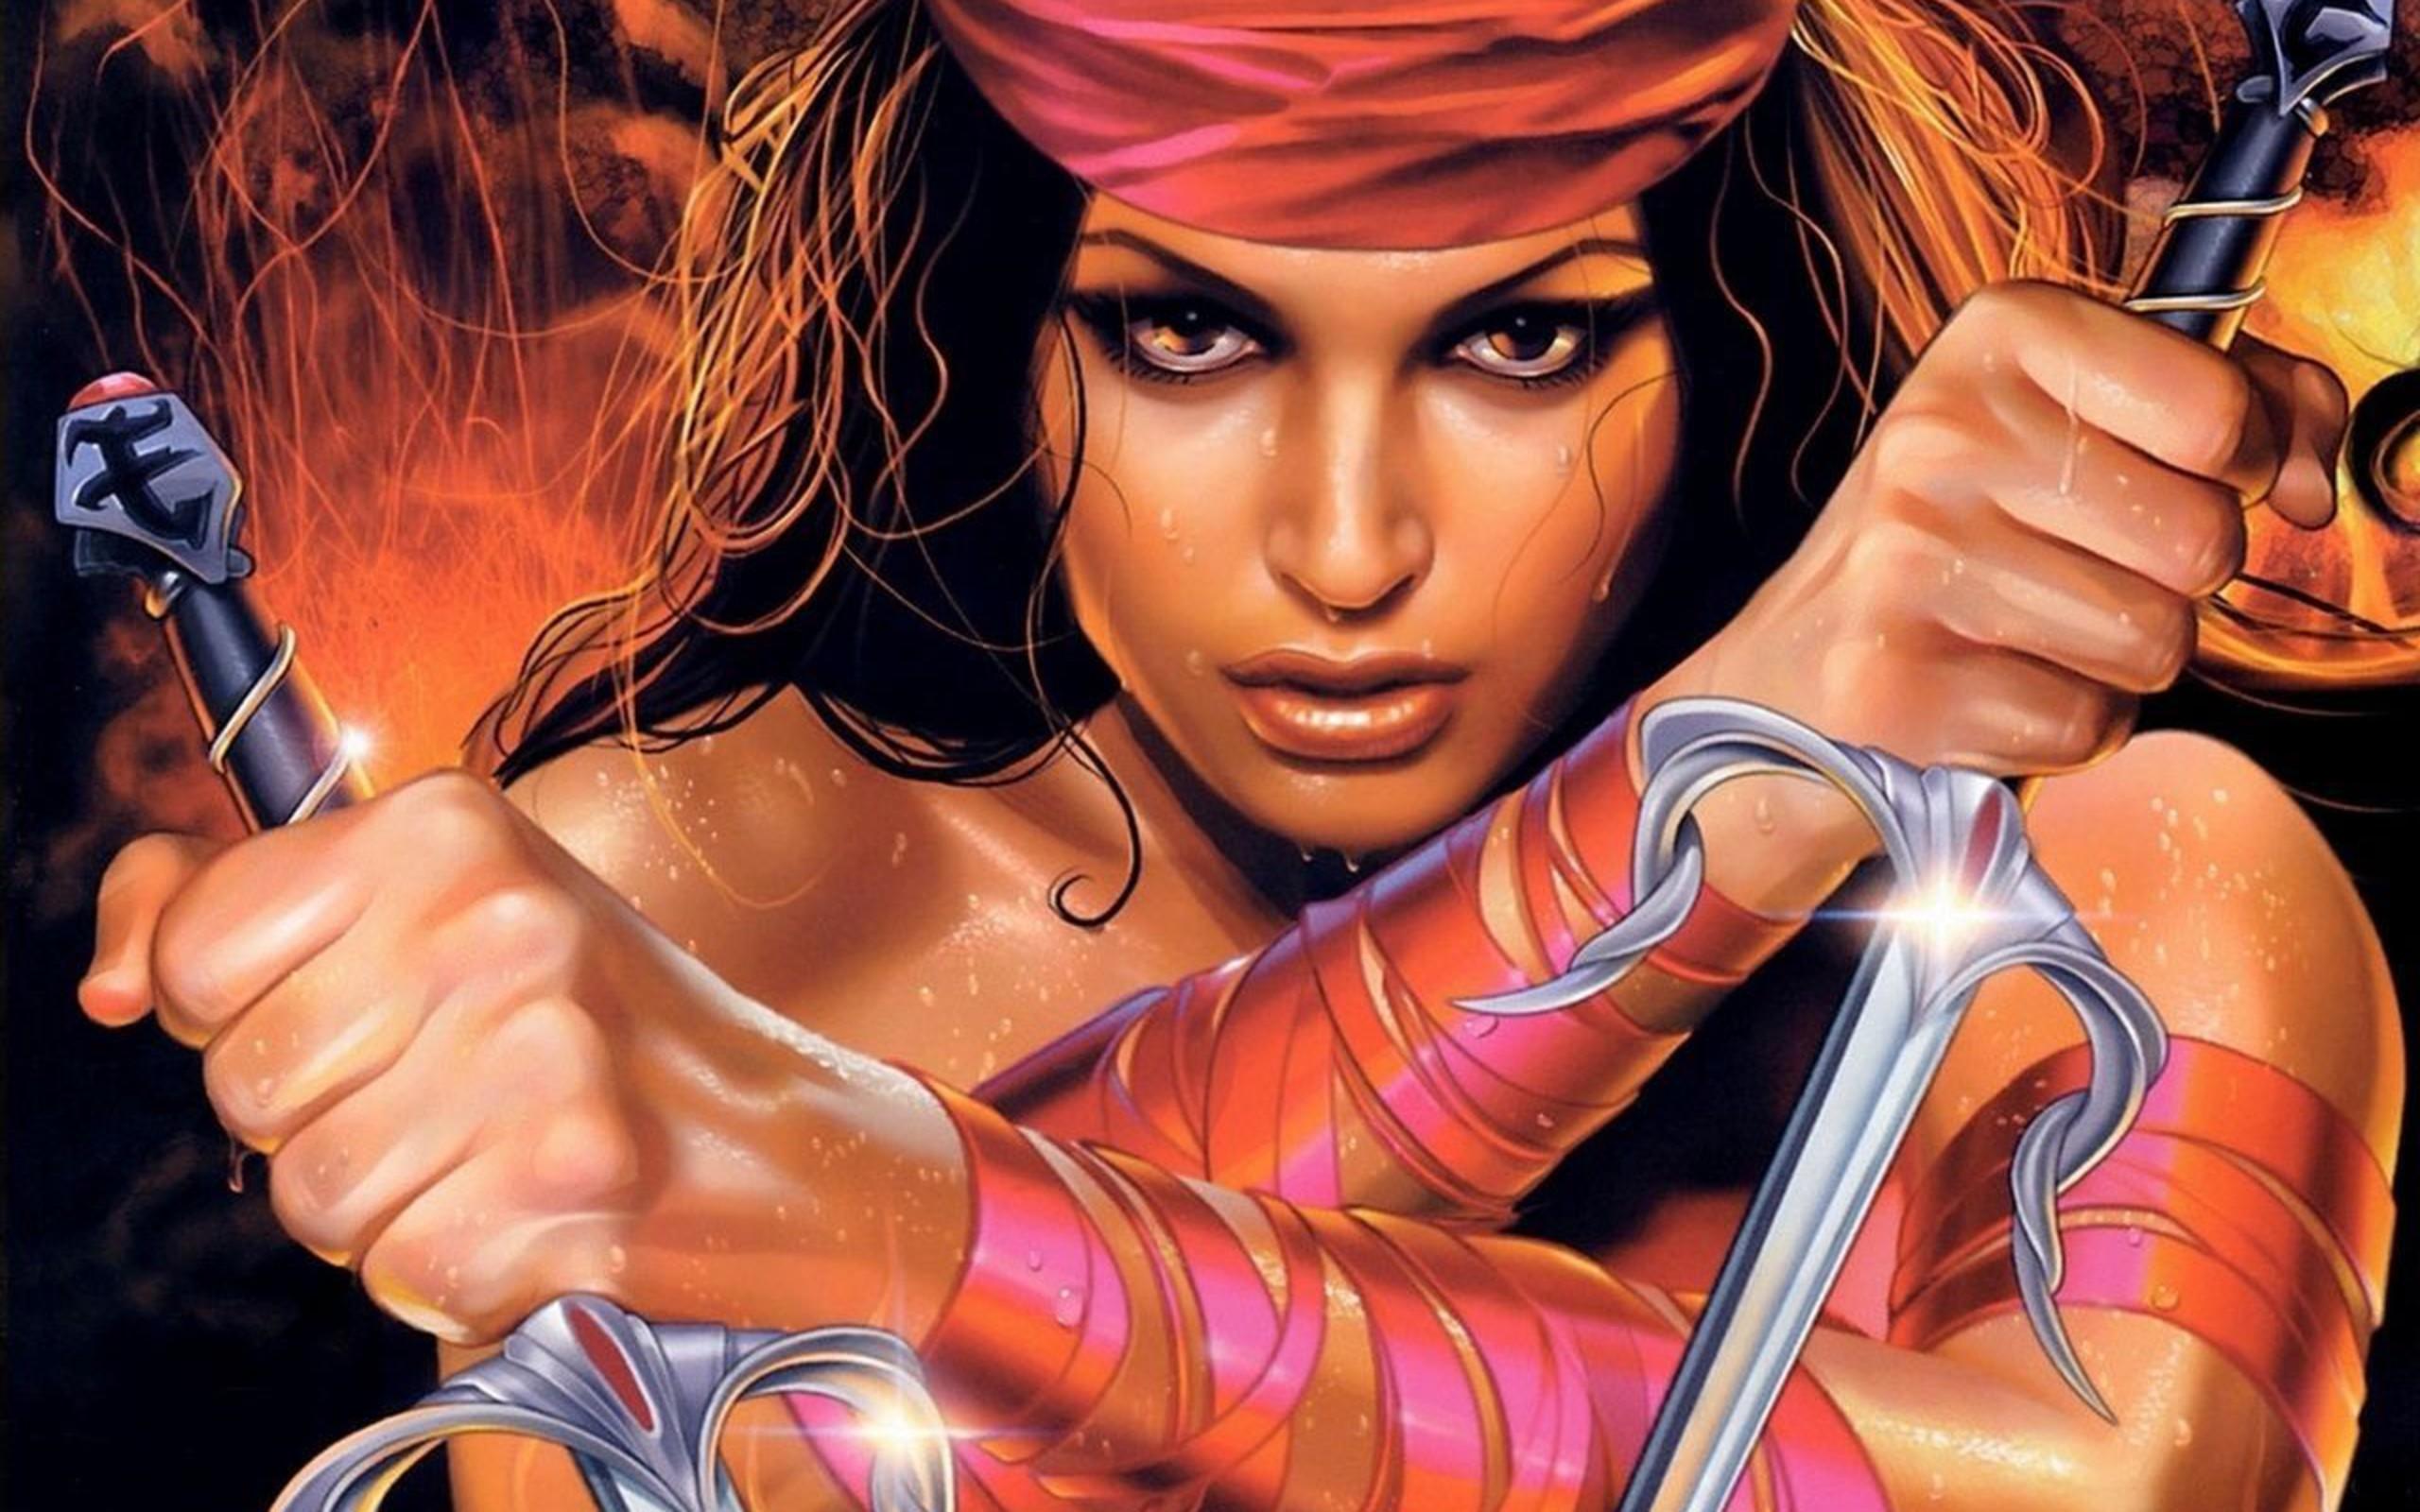 The eyes of the world hd wallpaper background image - Fantasy female warrior artwork ...